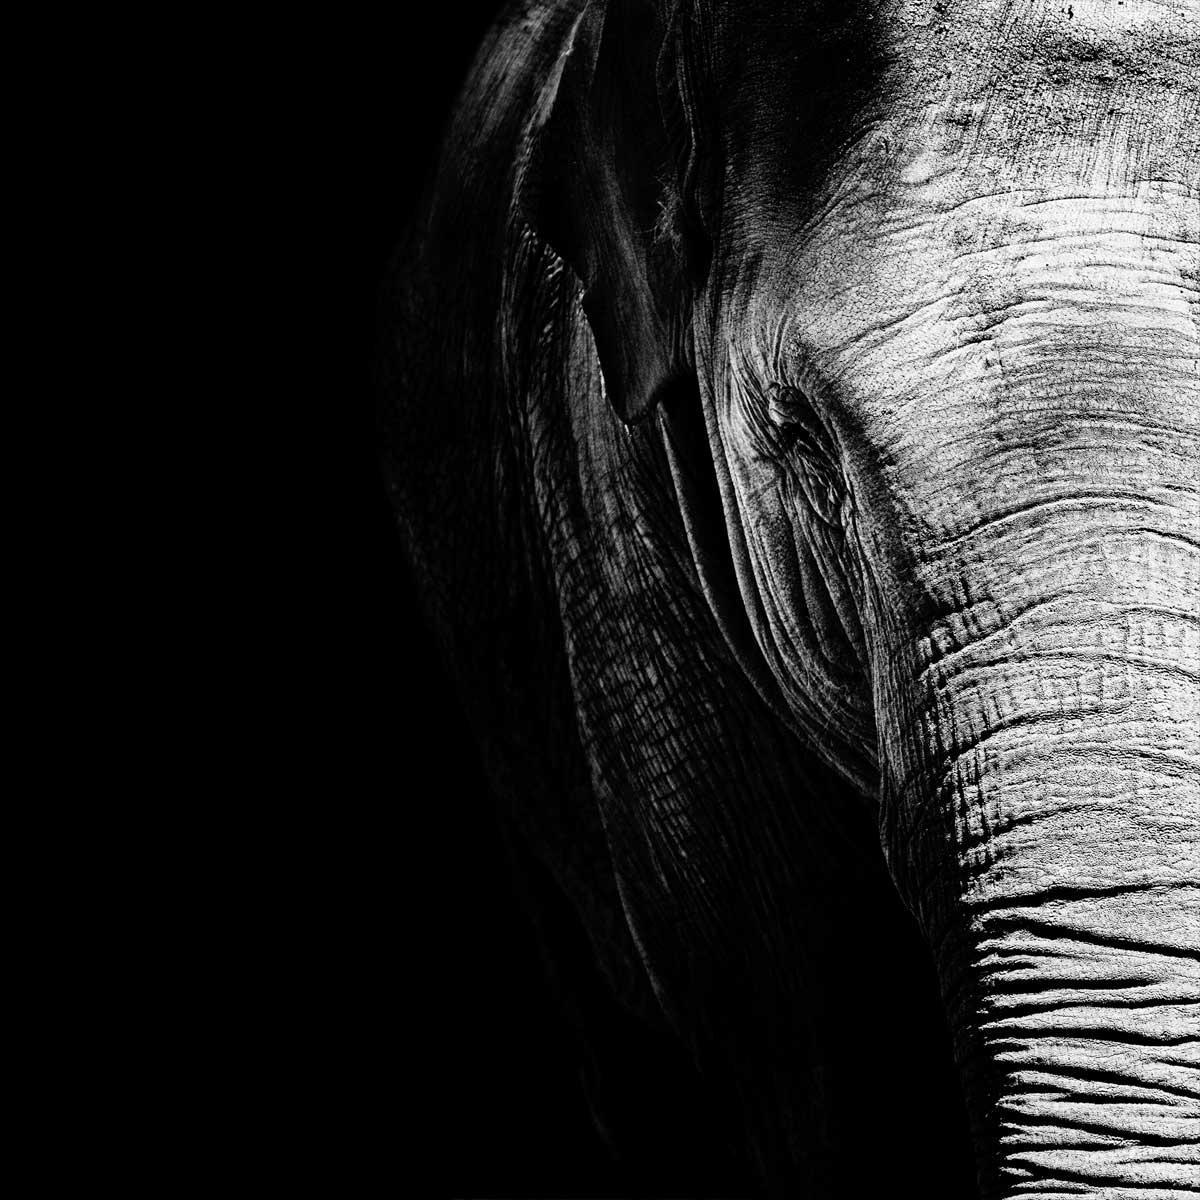 05-Elephas-Maximus